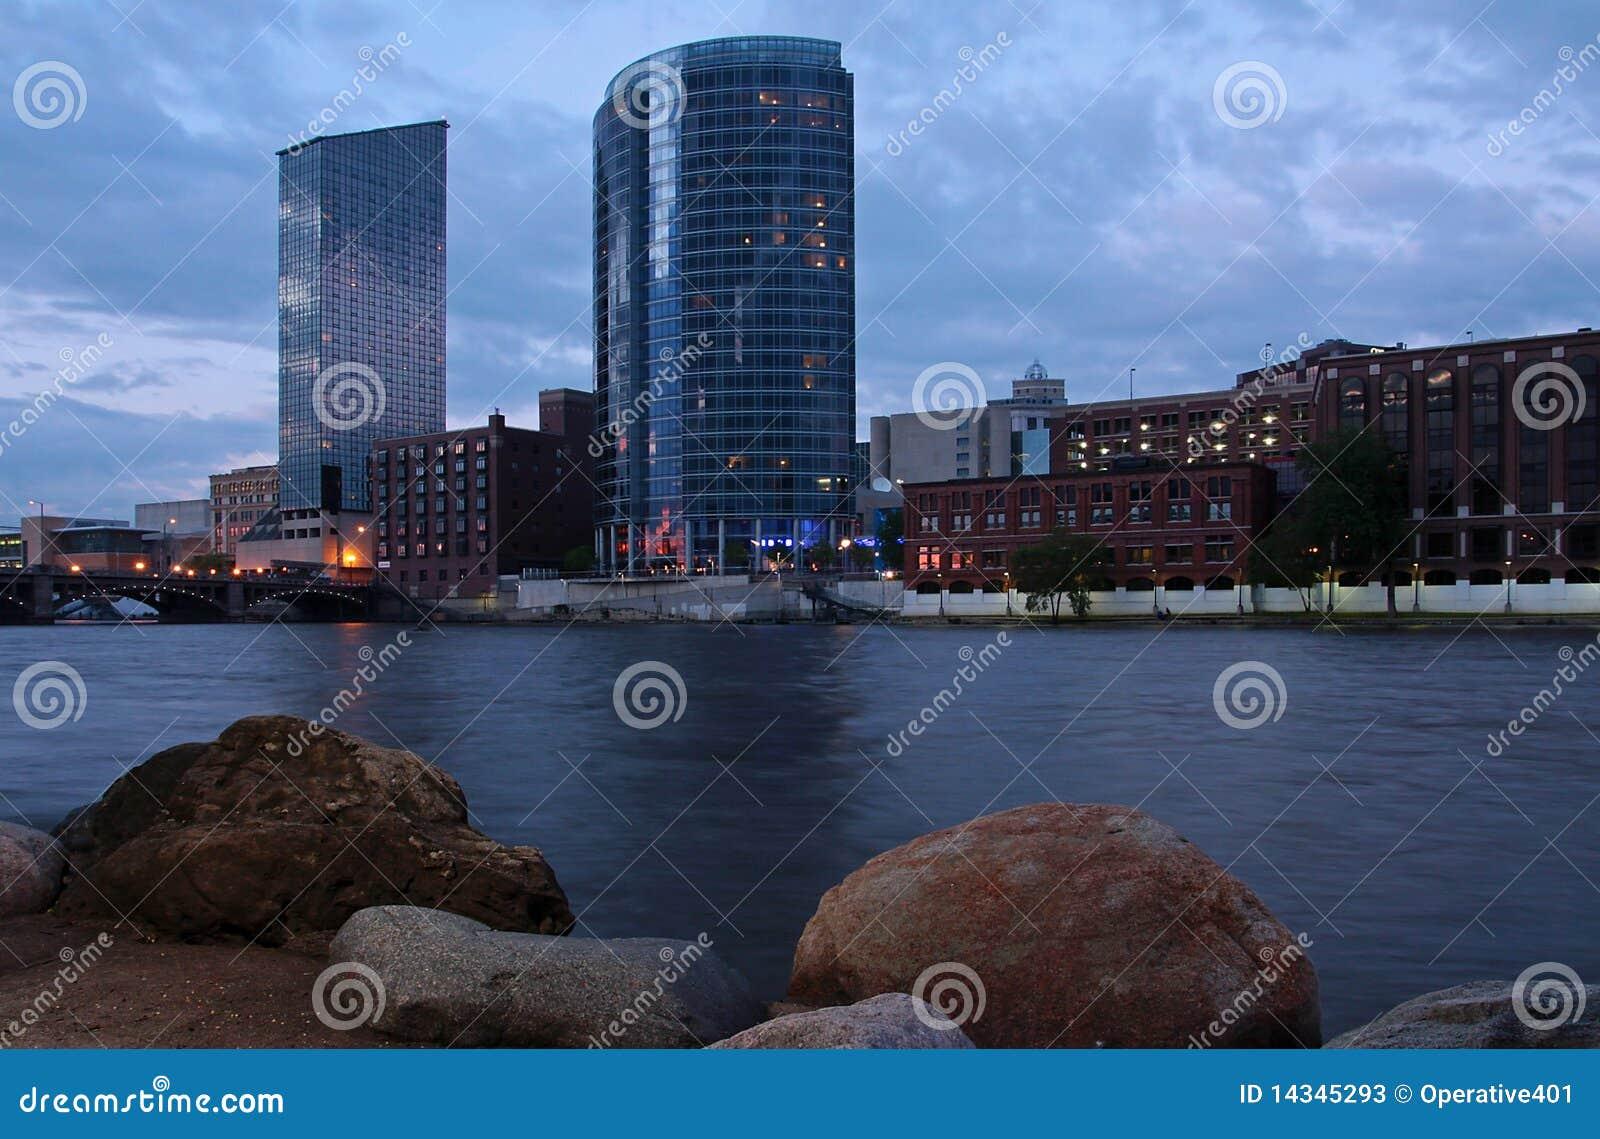 Scenic Grand Rapids, Michigan. Royalty-Free Stock Photo